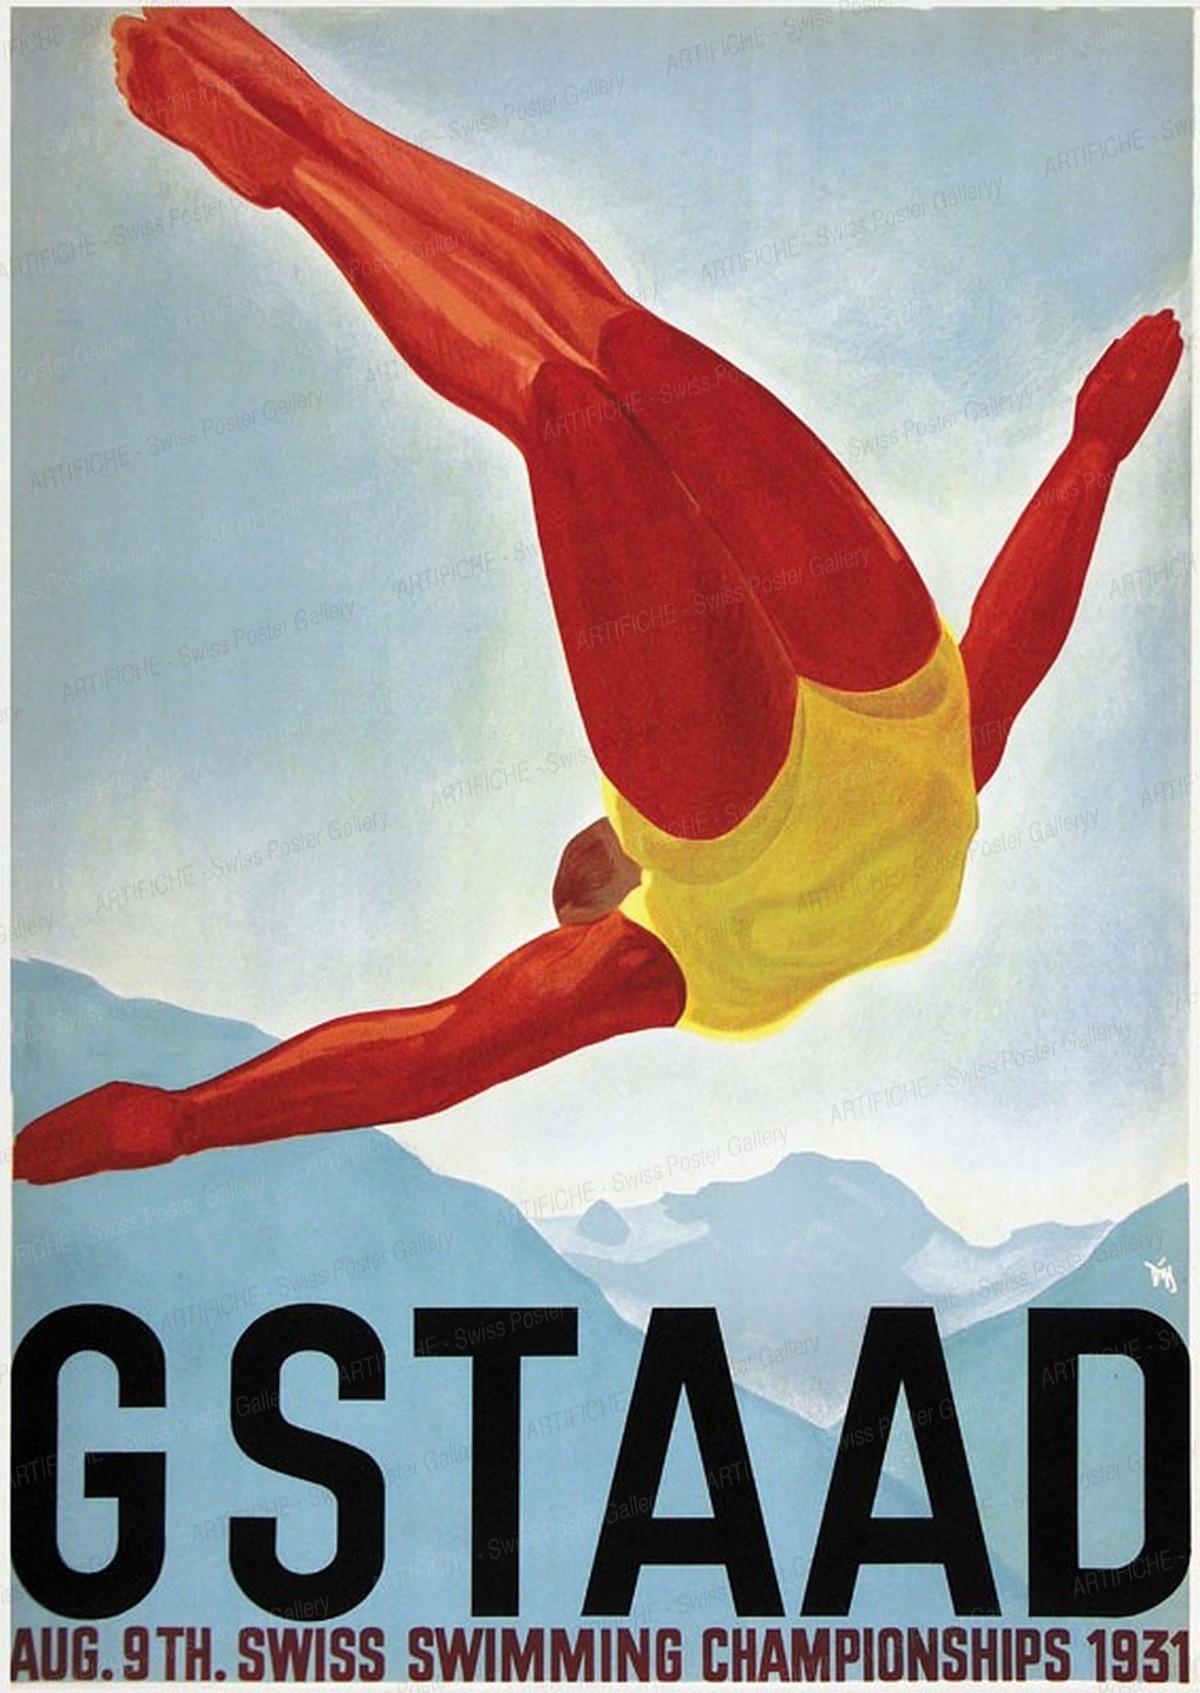 GSTAAD – Swiss Swimming Championships – Aug. 9th. 1931, Alex Walter Diggelmann